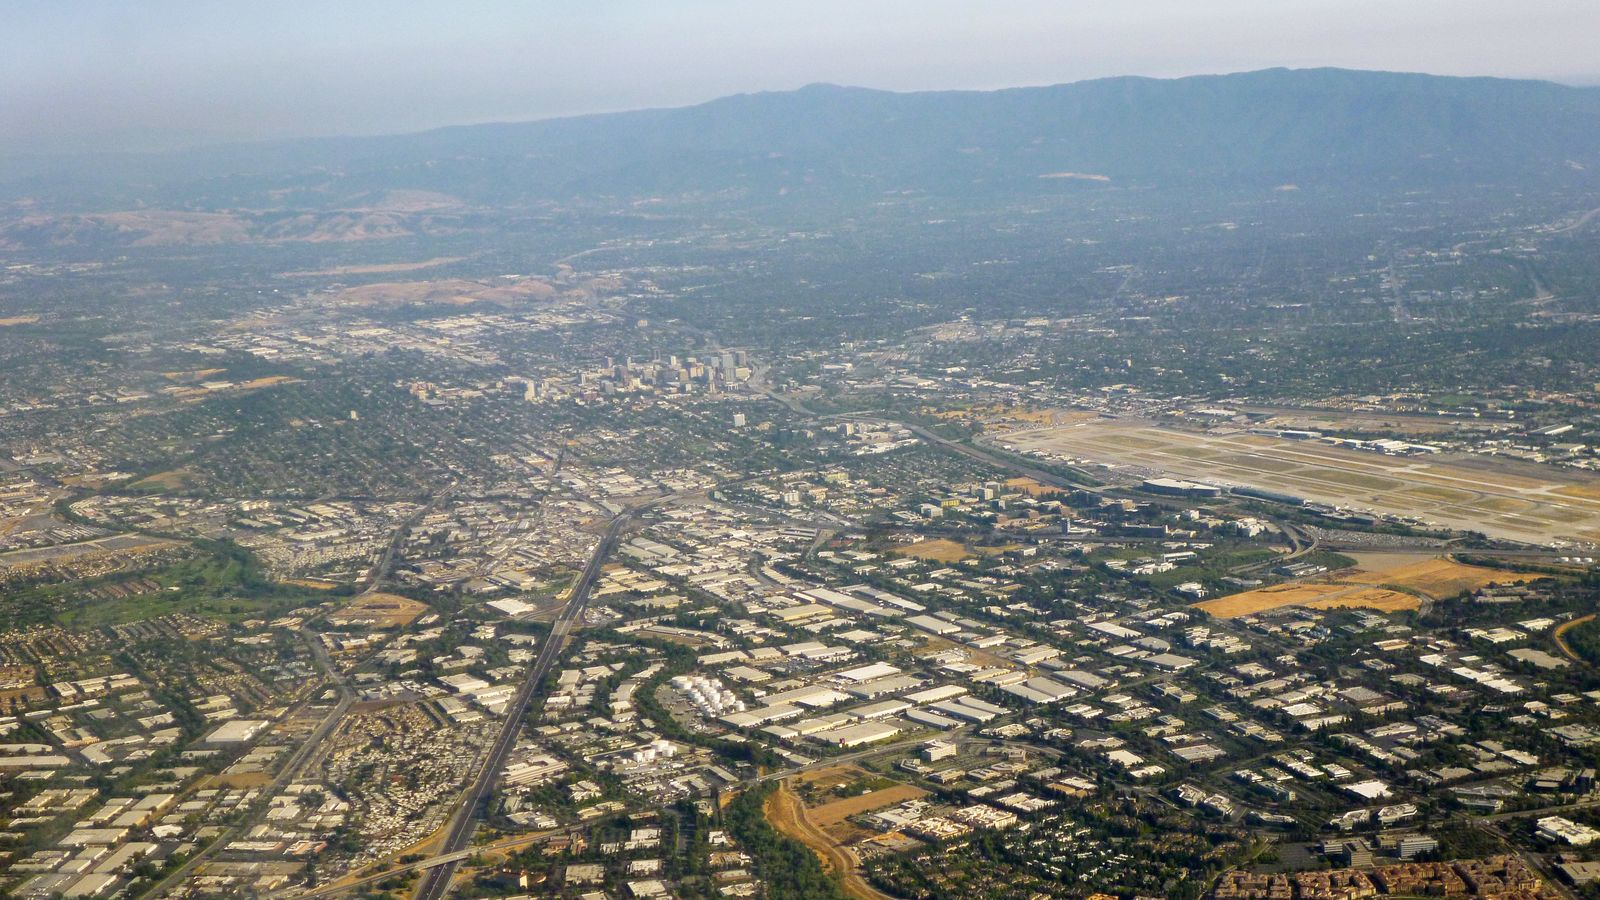 Foto: Vista panorámica de Silicon Valley. (Coolcaesar, Wikipedia)